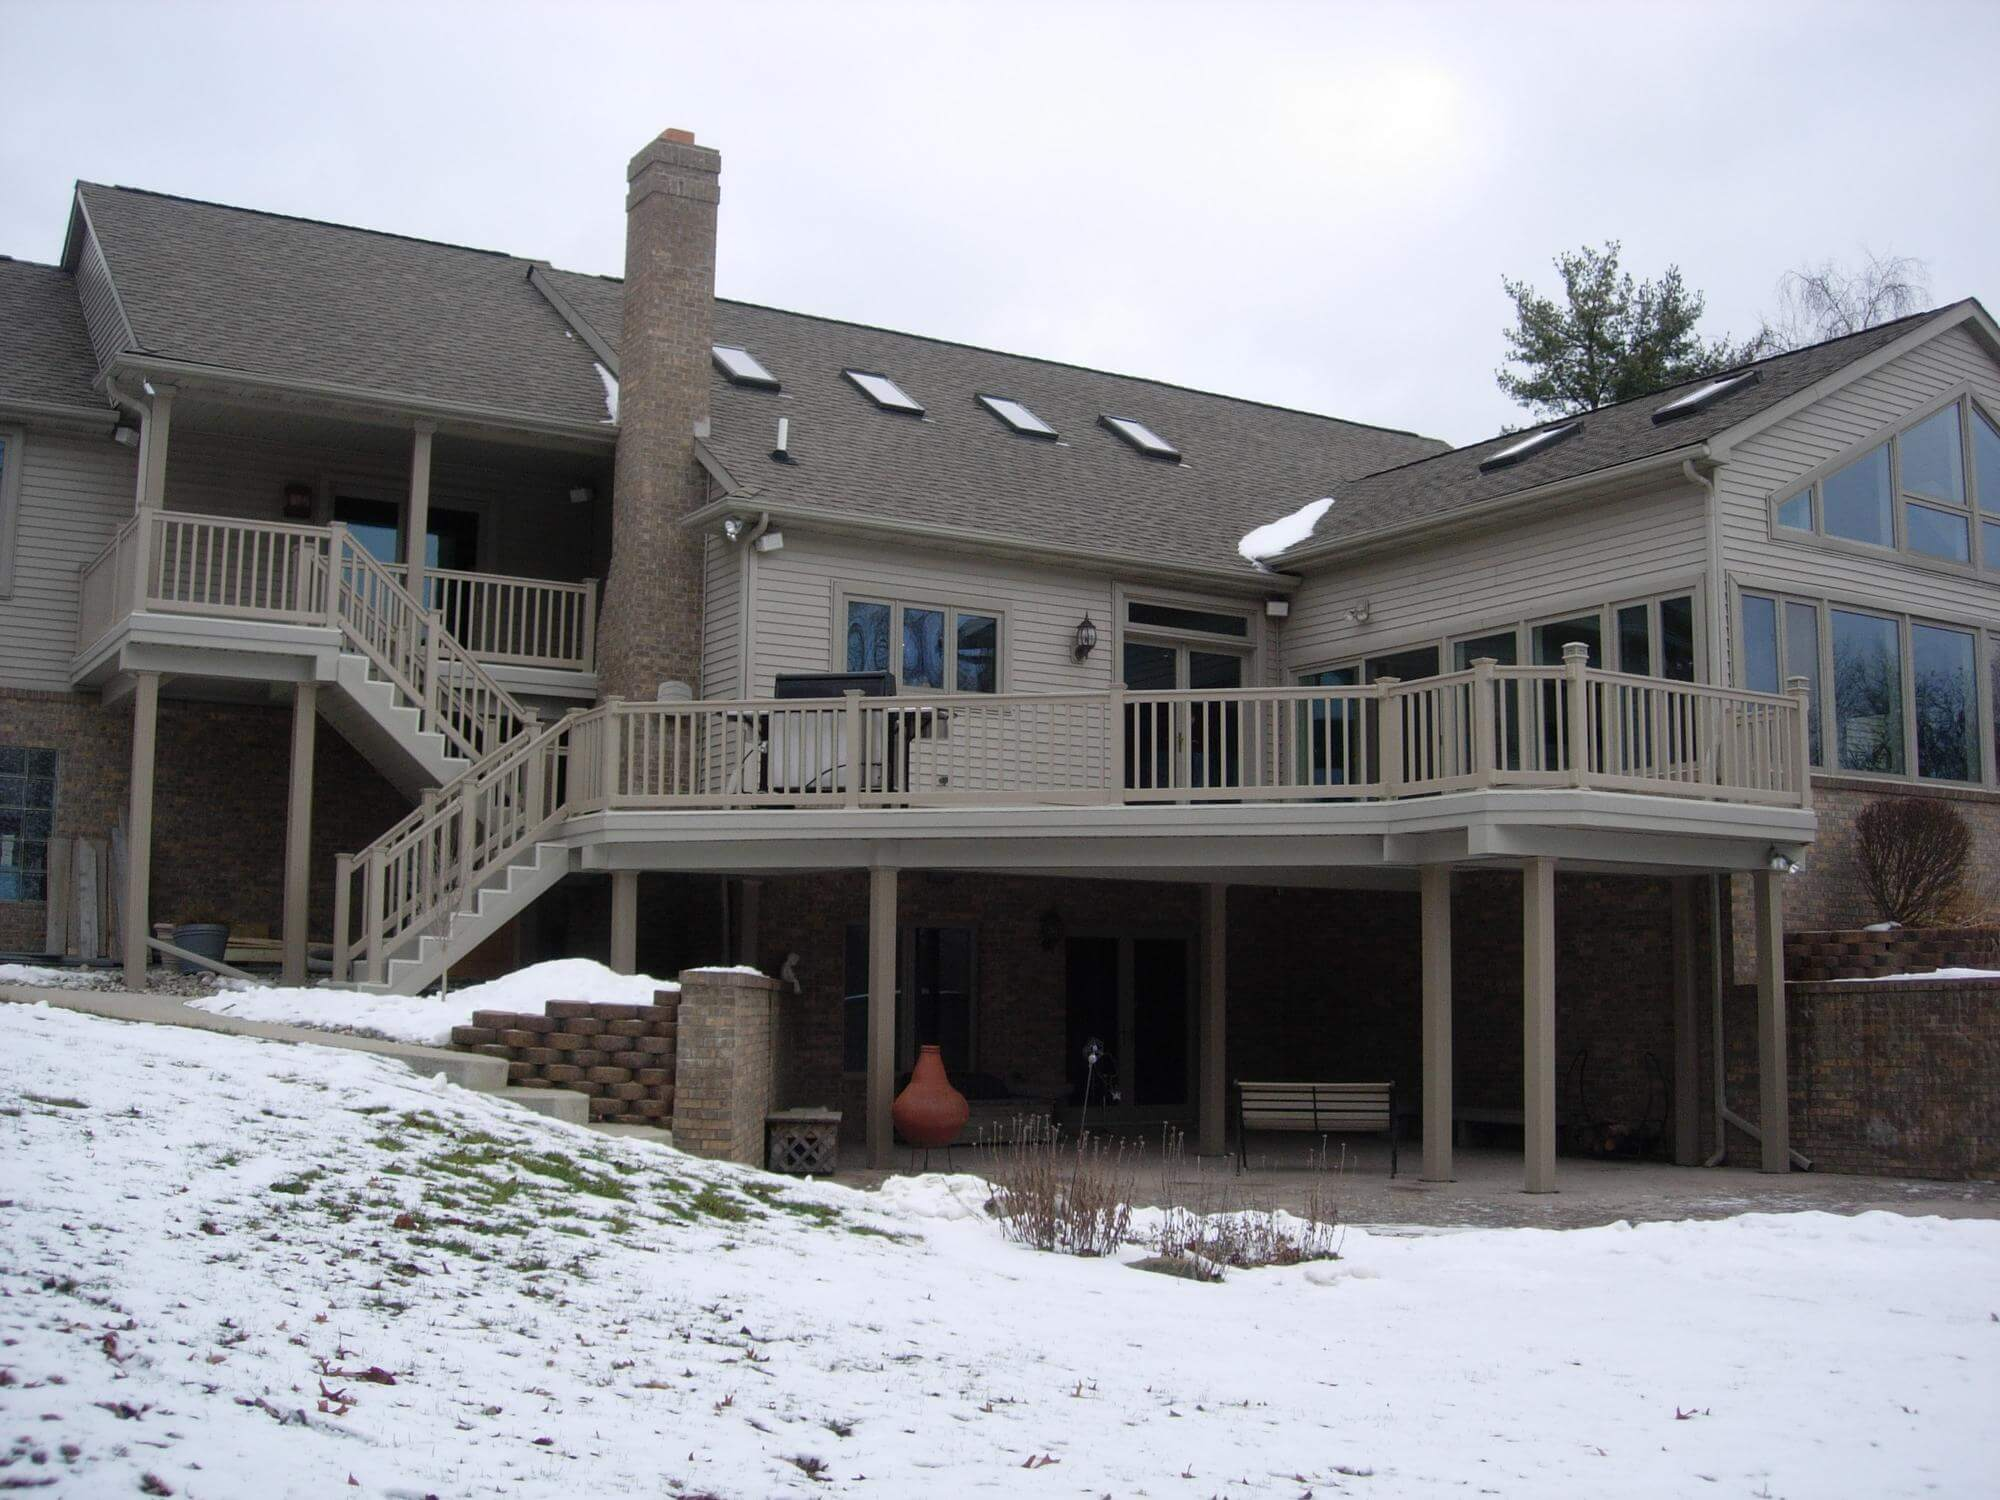 wahoo aluminum deck on a house with wahoo rail